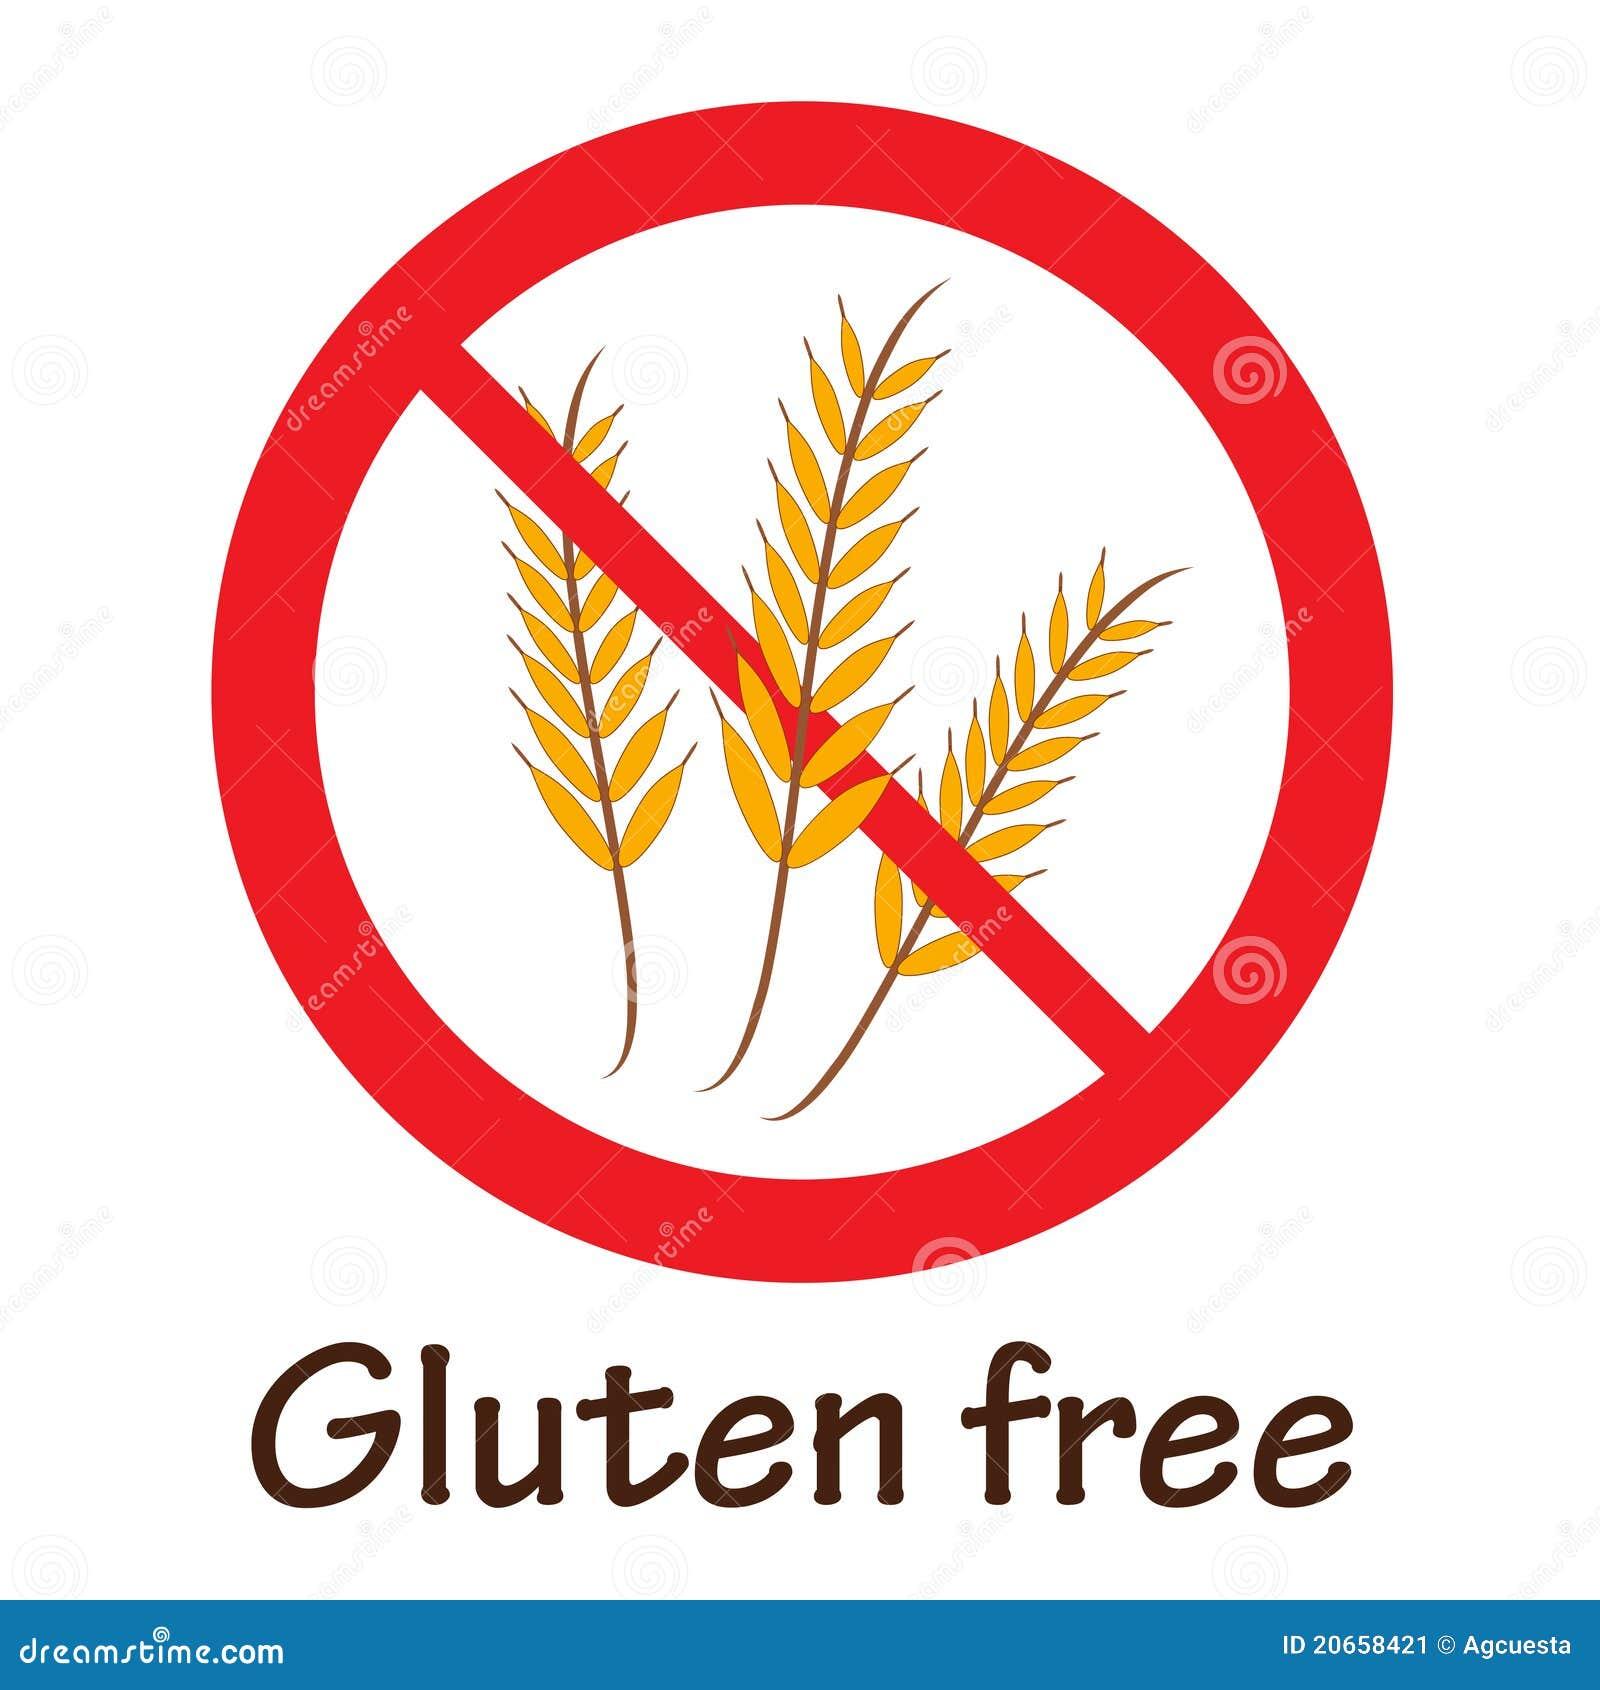 Gluten Free Symbol Stock Vector Illustration Of Group 21697098